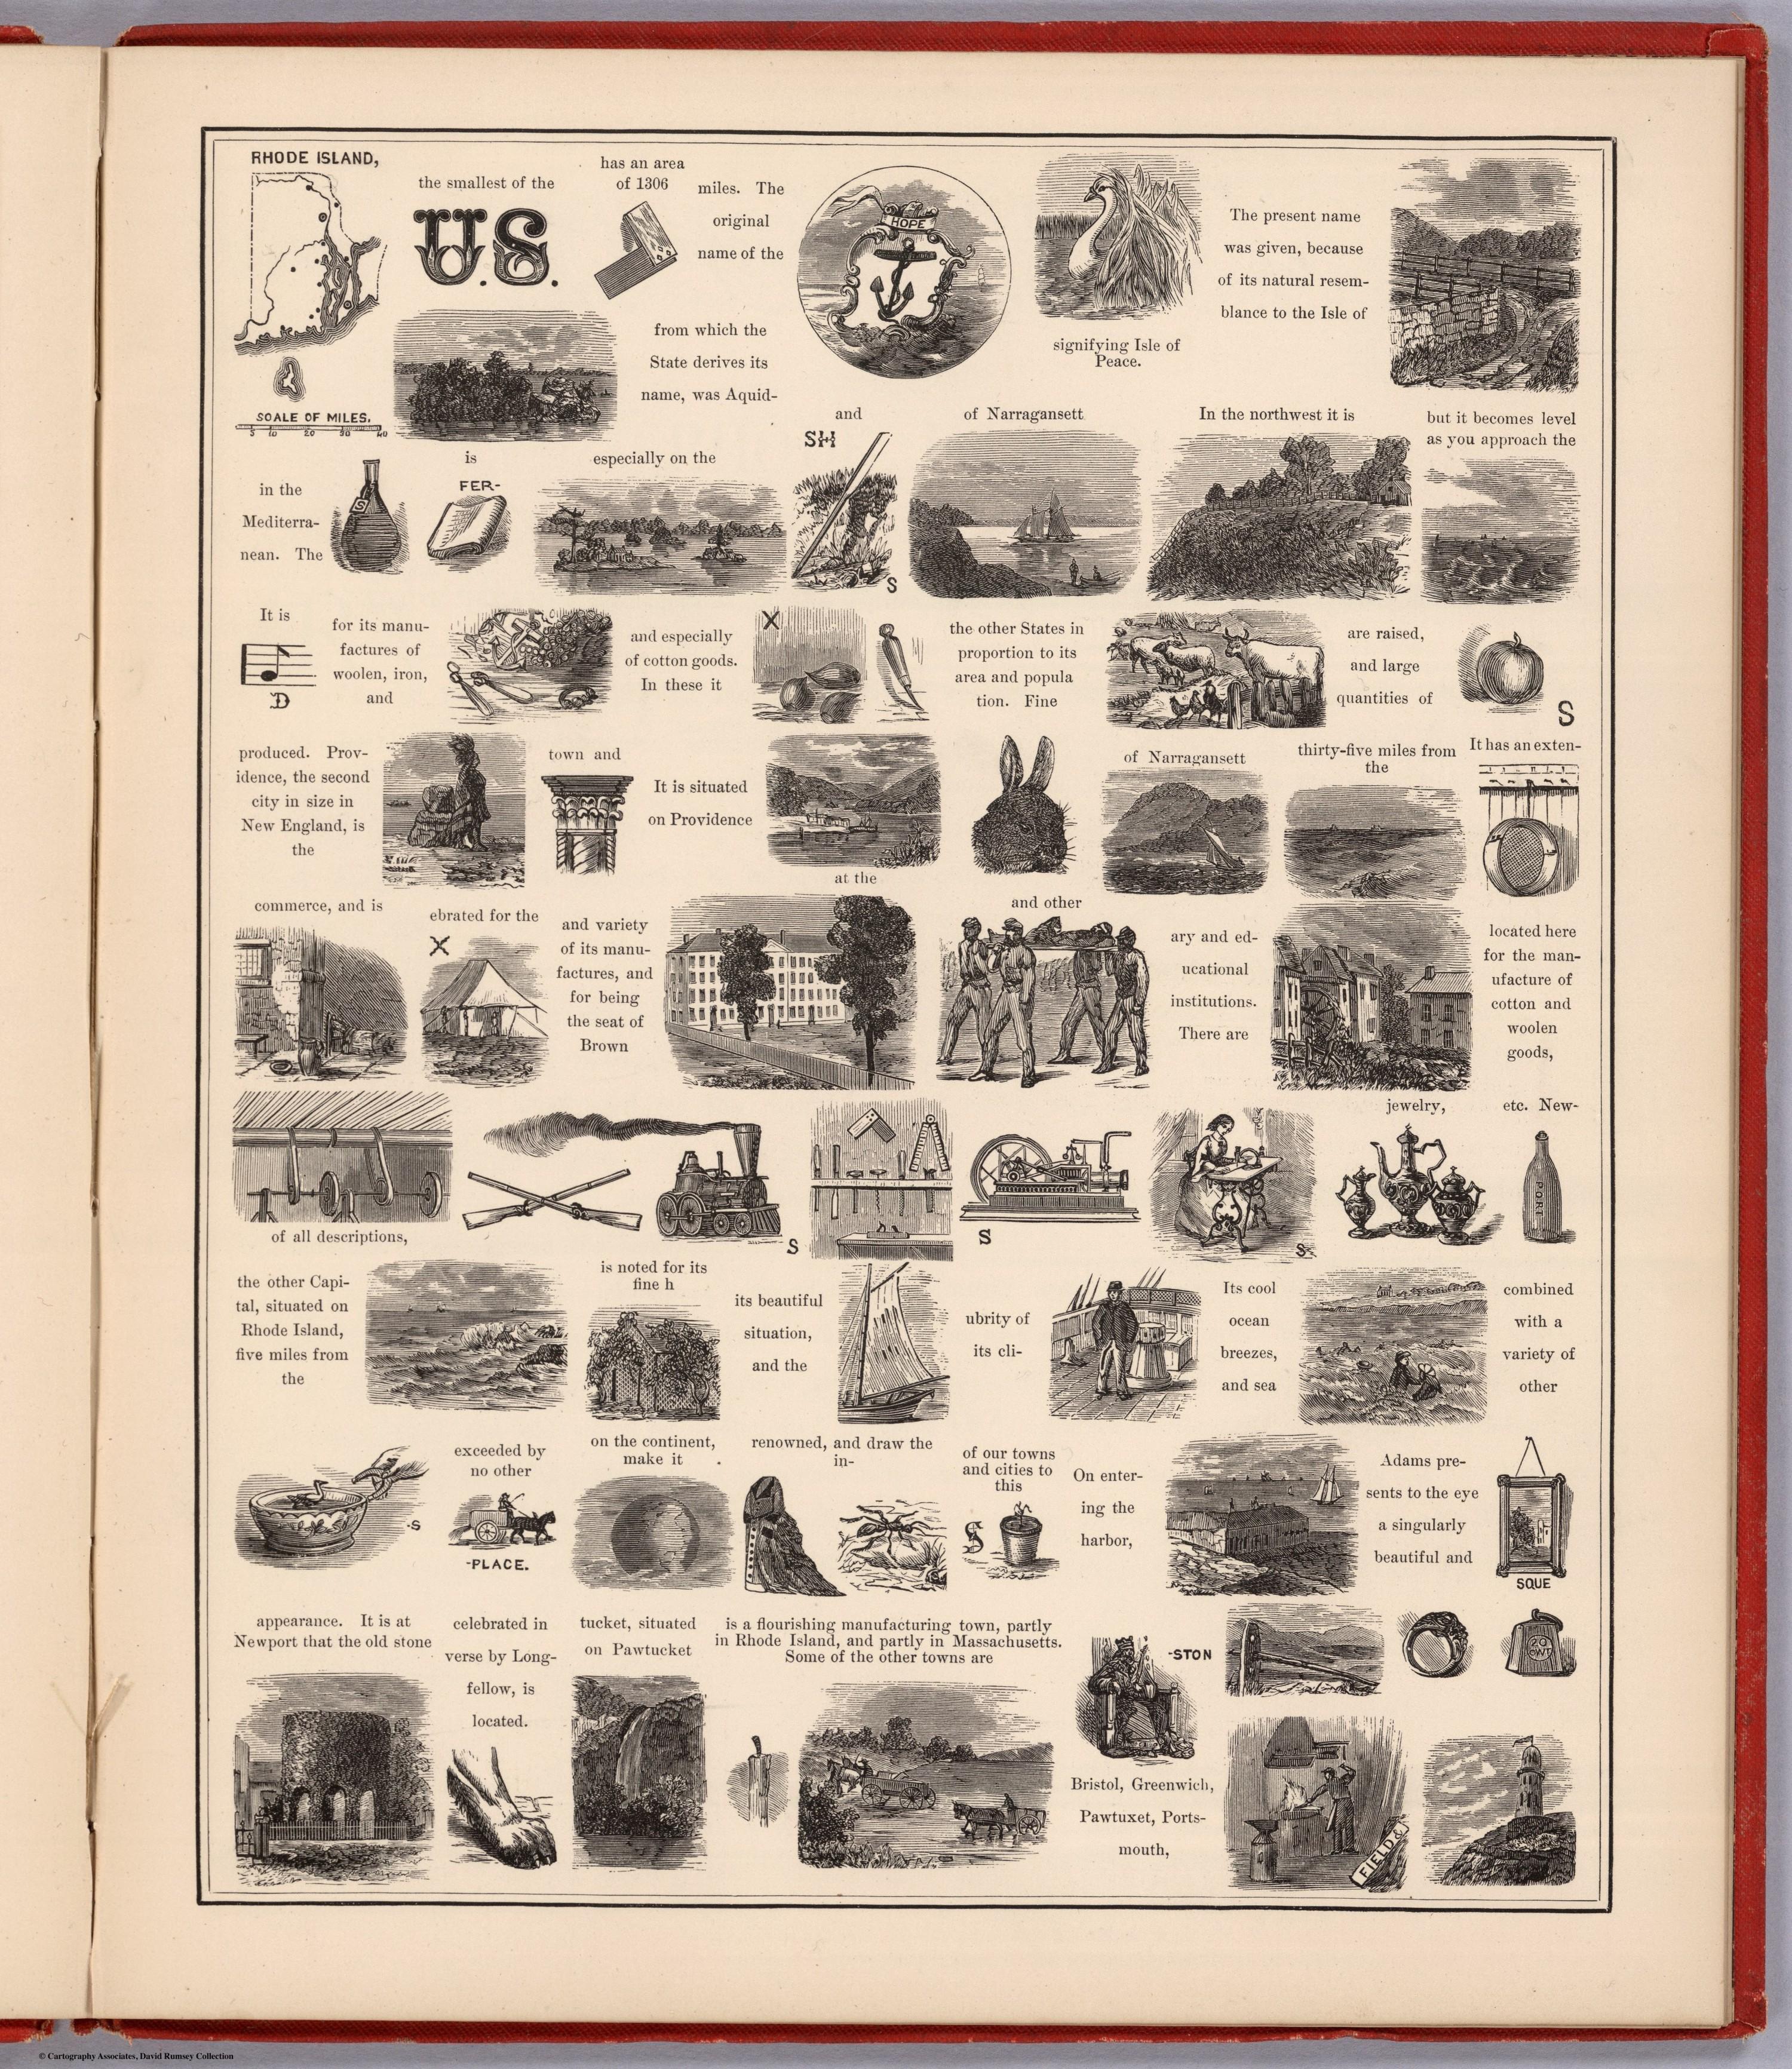 Hieroglyphic Geography of Rhode Island